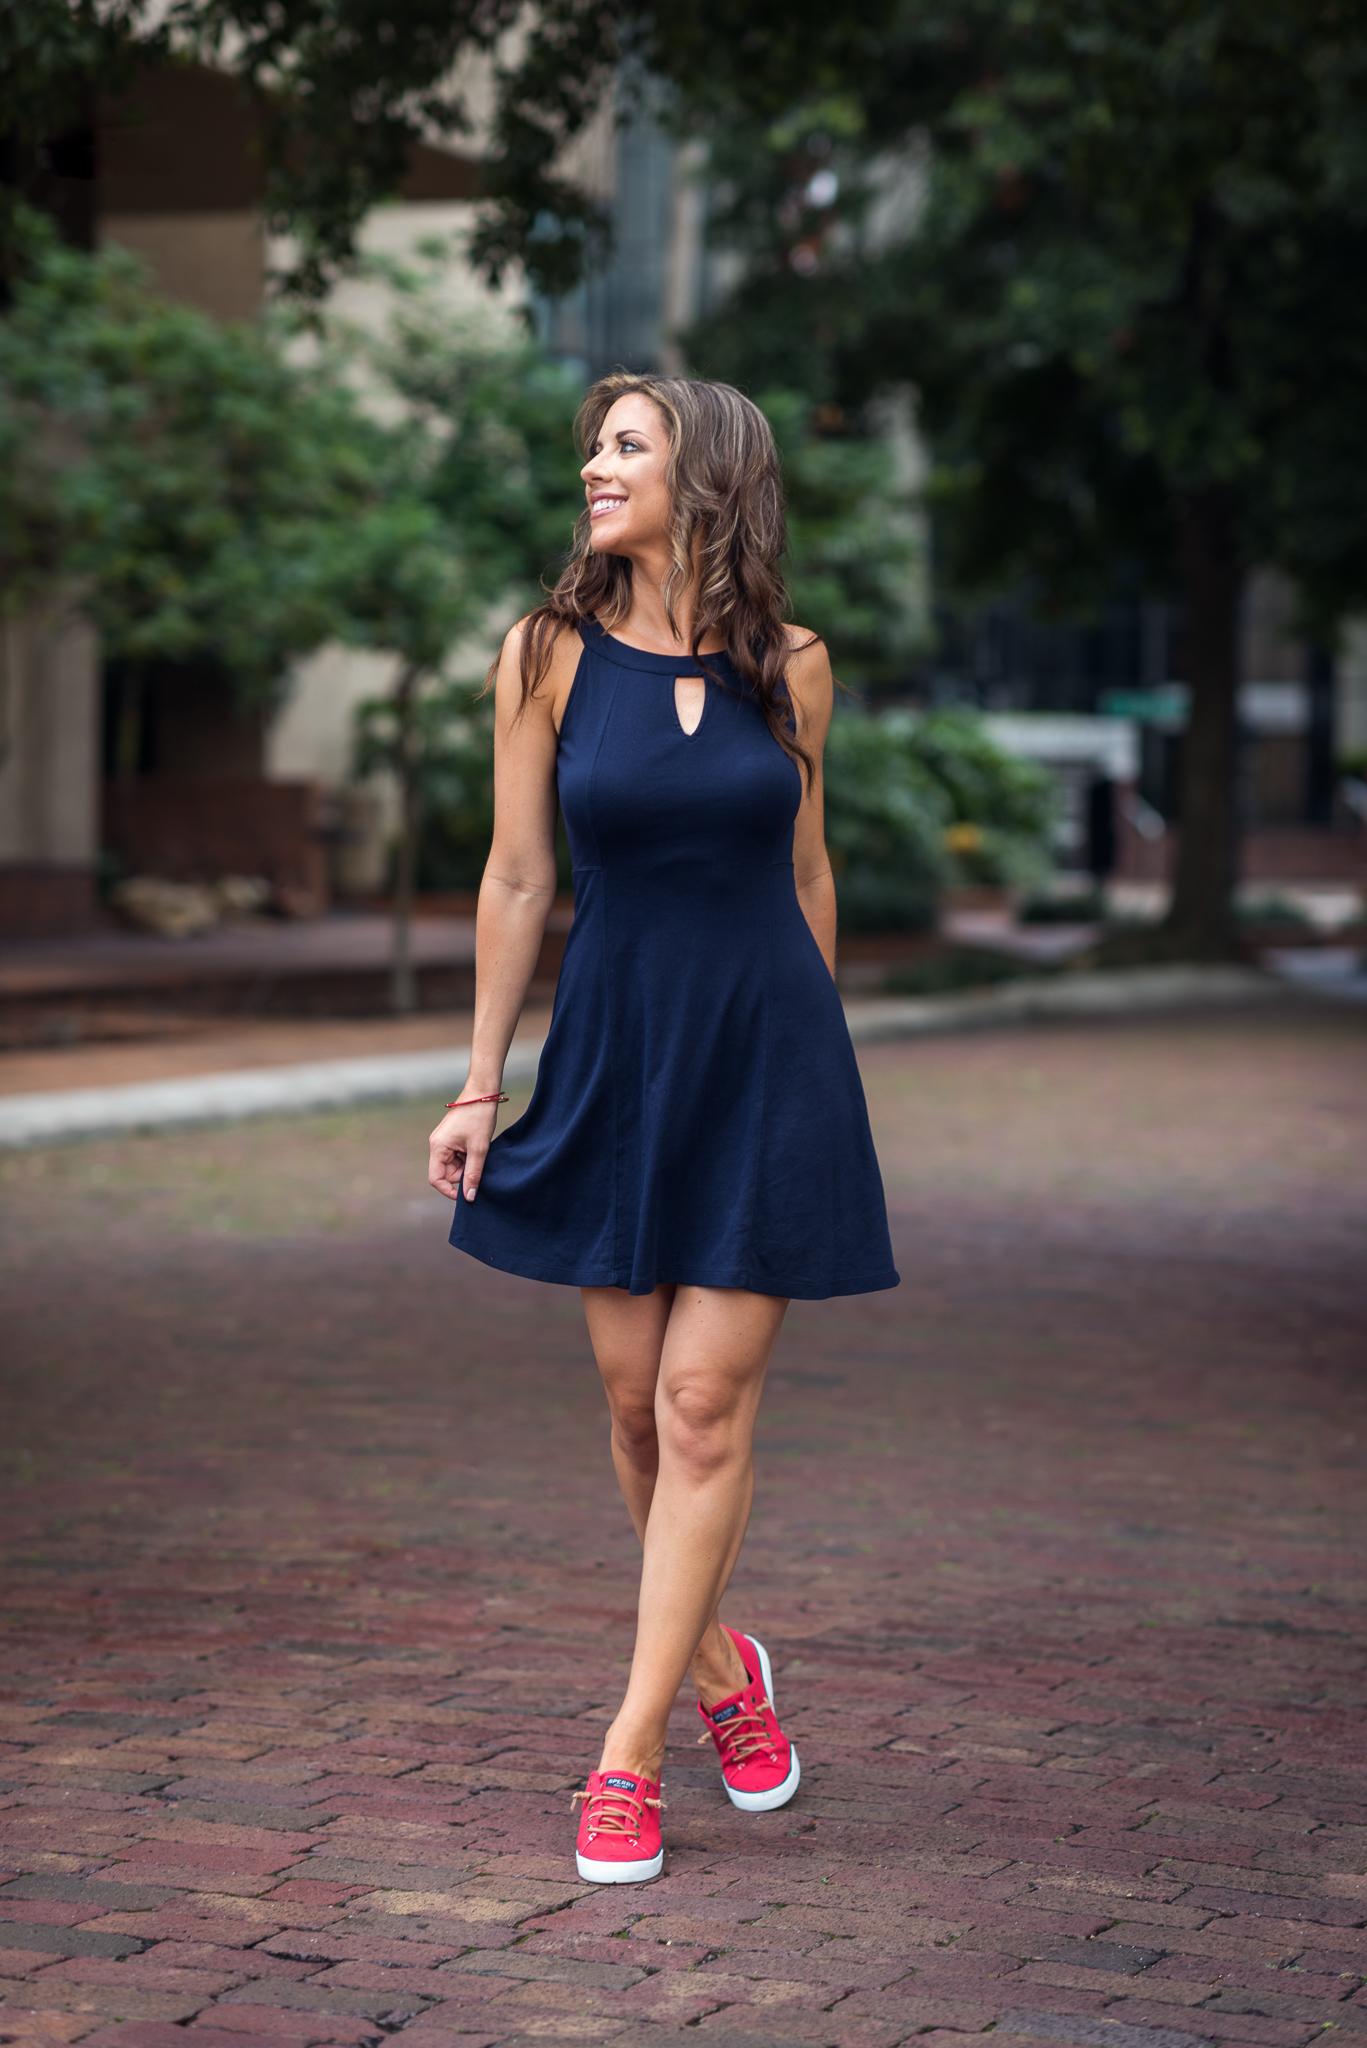 Kristin Alongi - Fashion Blogger, Suits N' Sneaks